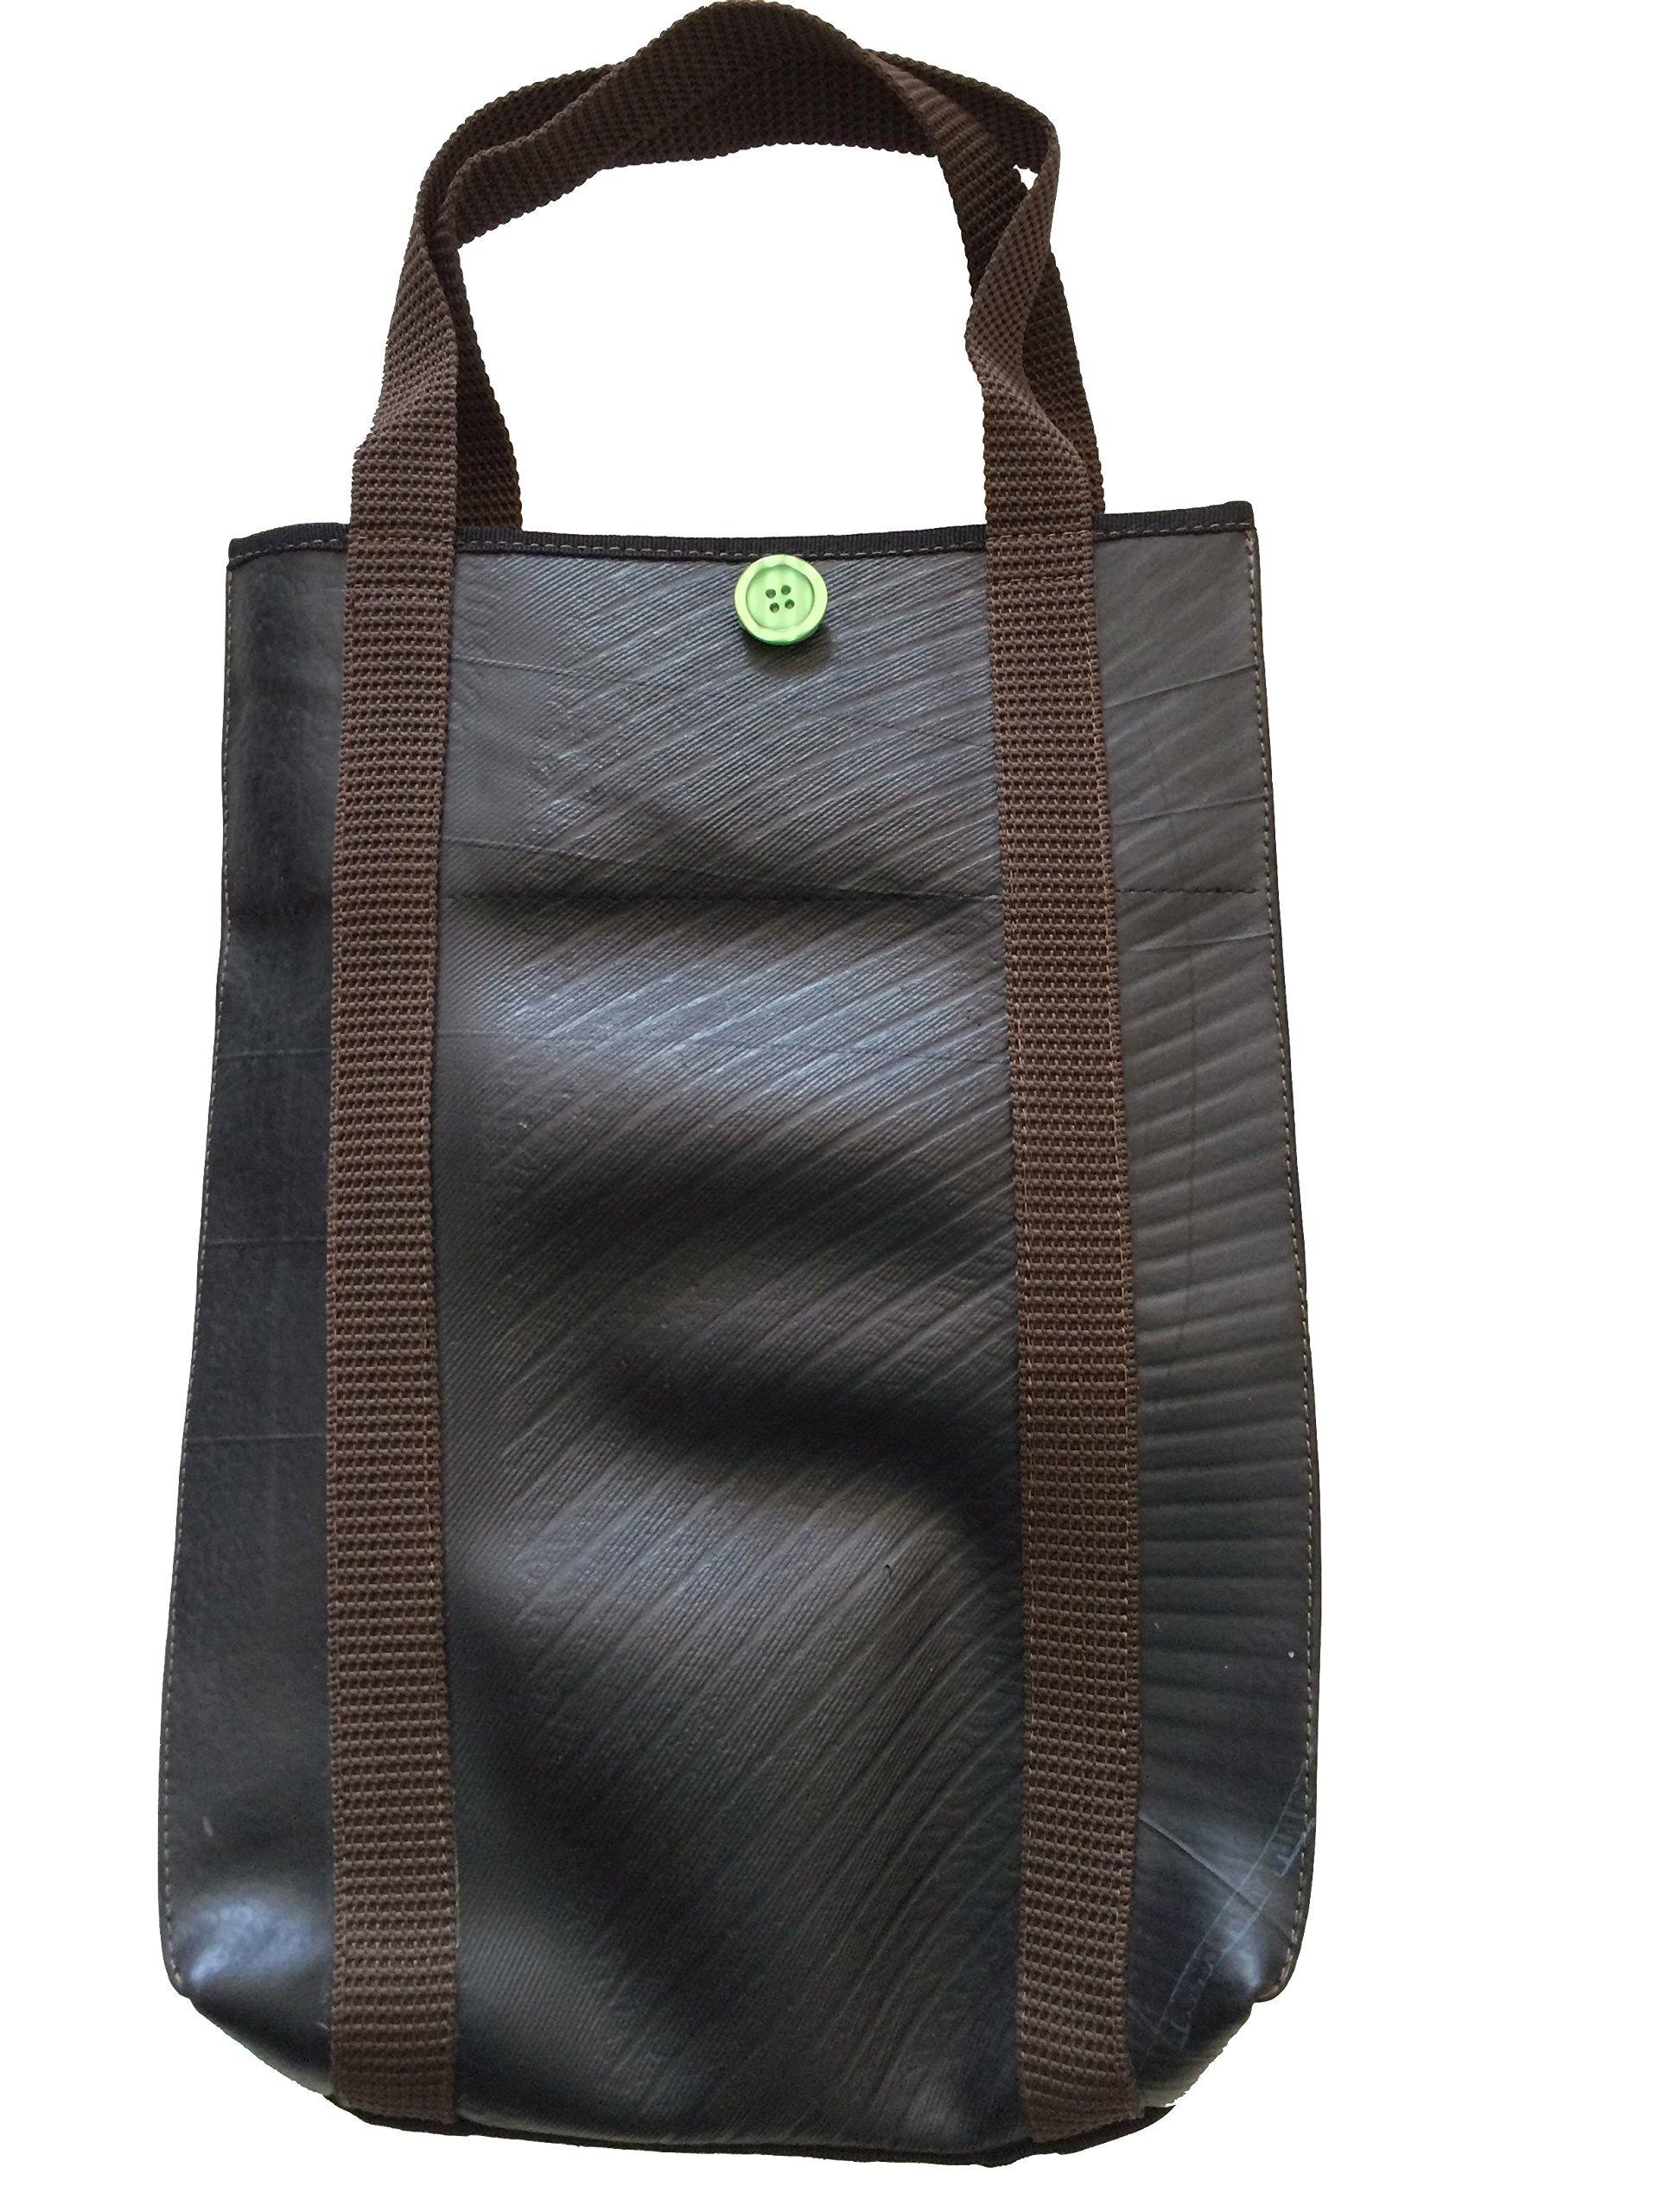 Recycled rubber Tote handbag Bagy - handmade-bags